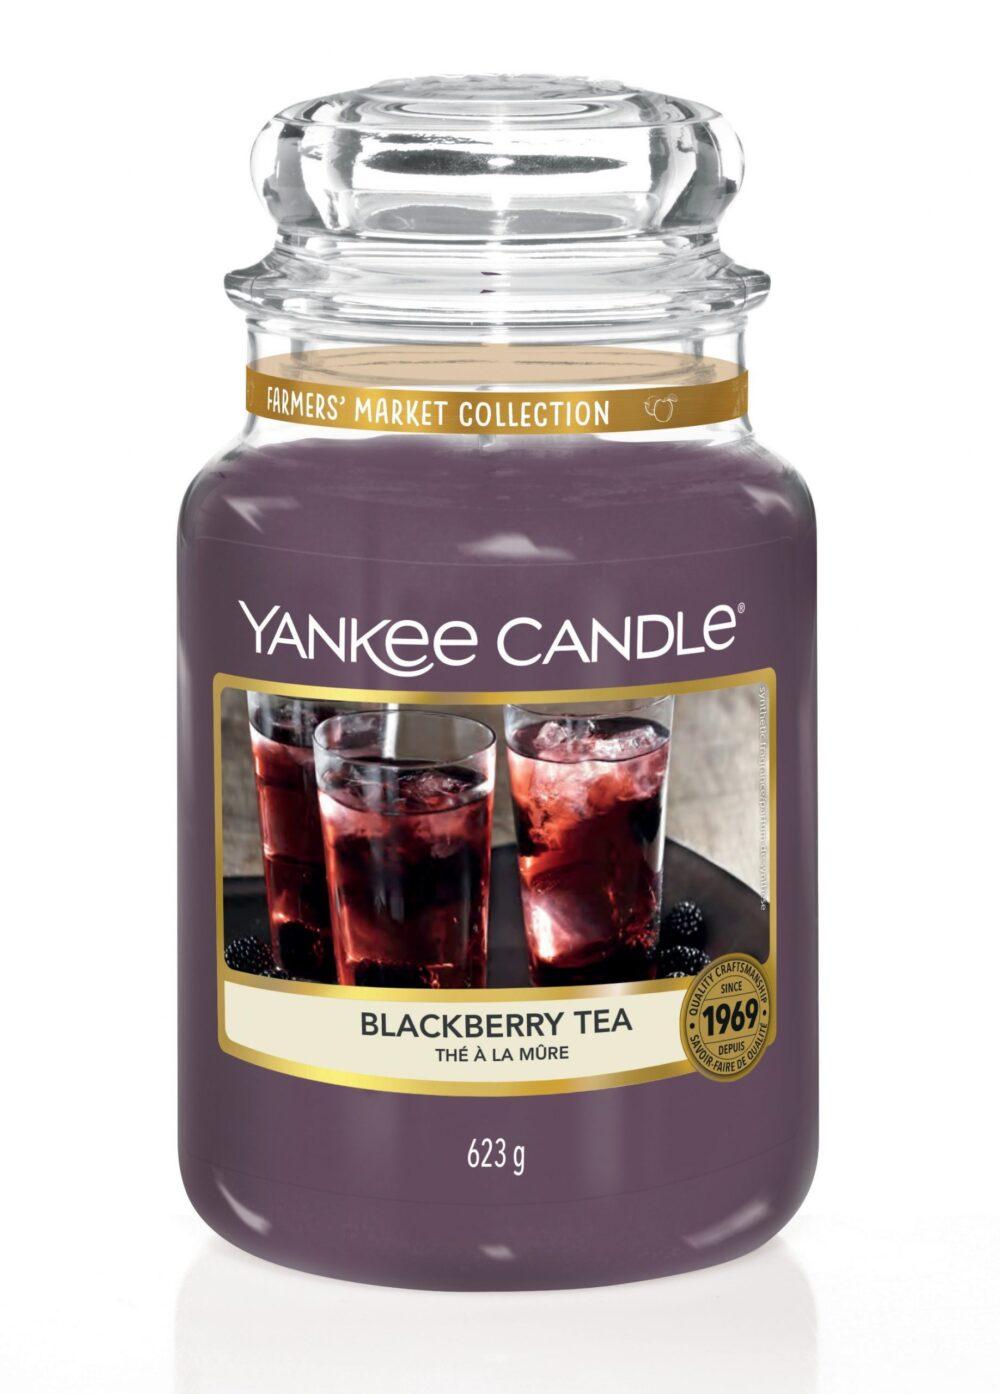 blackberry tea sloik duzy